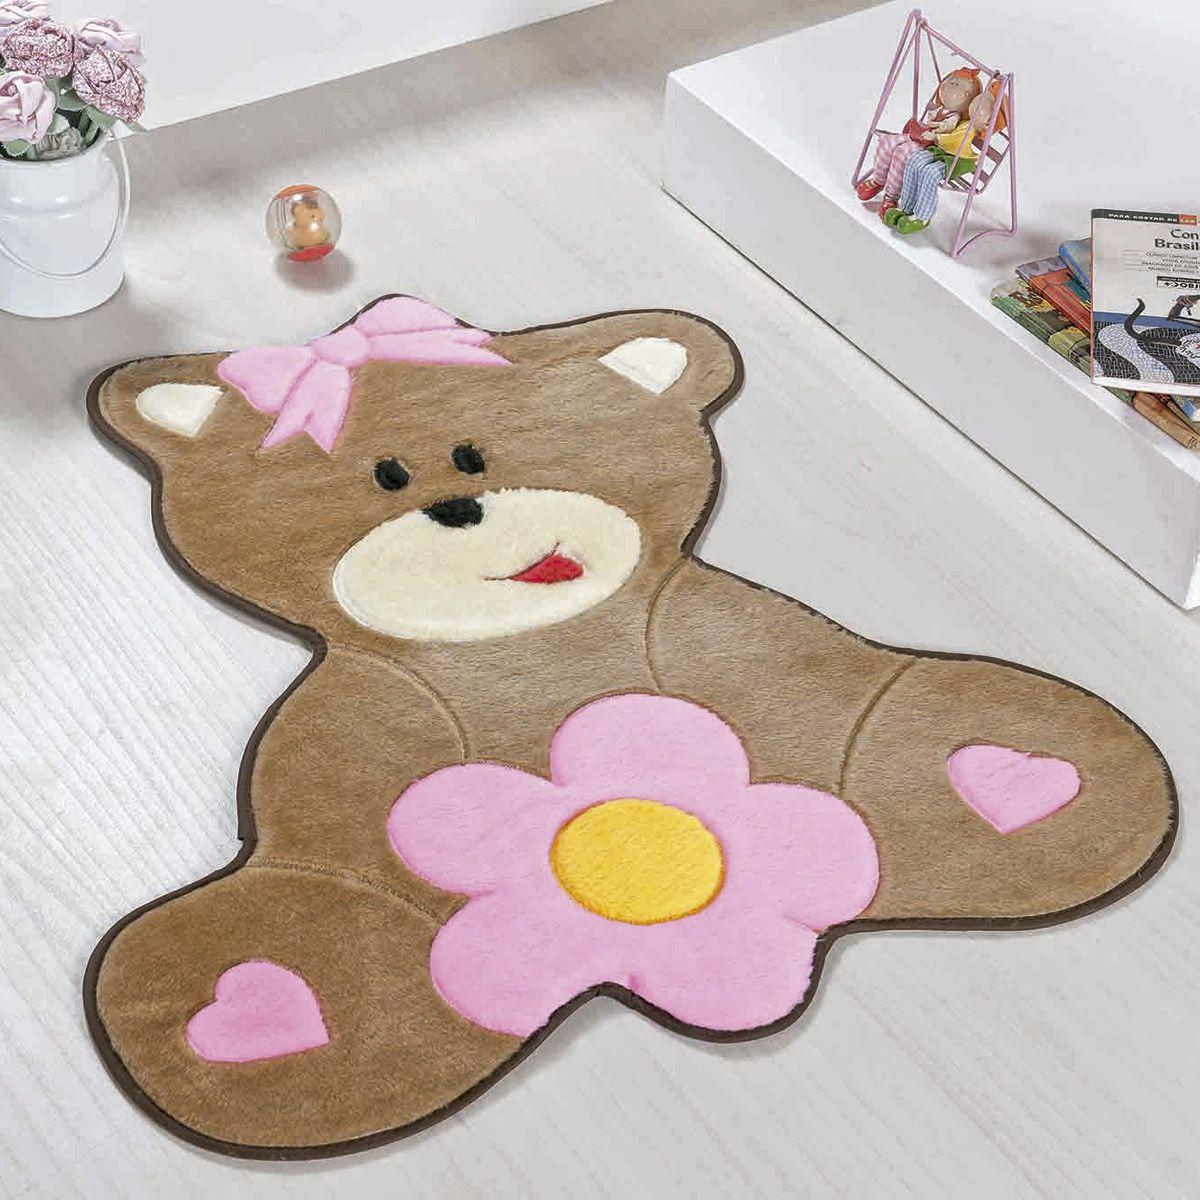 Tapete Infantil Premium Formato Urso Baby Rosa 75cm x 62cm